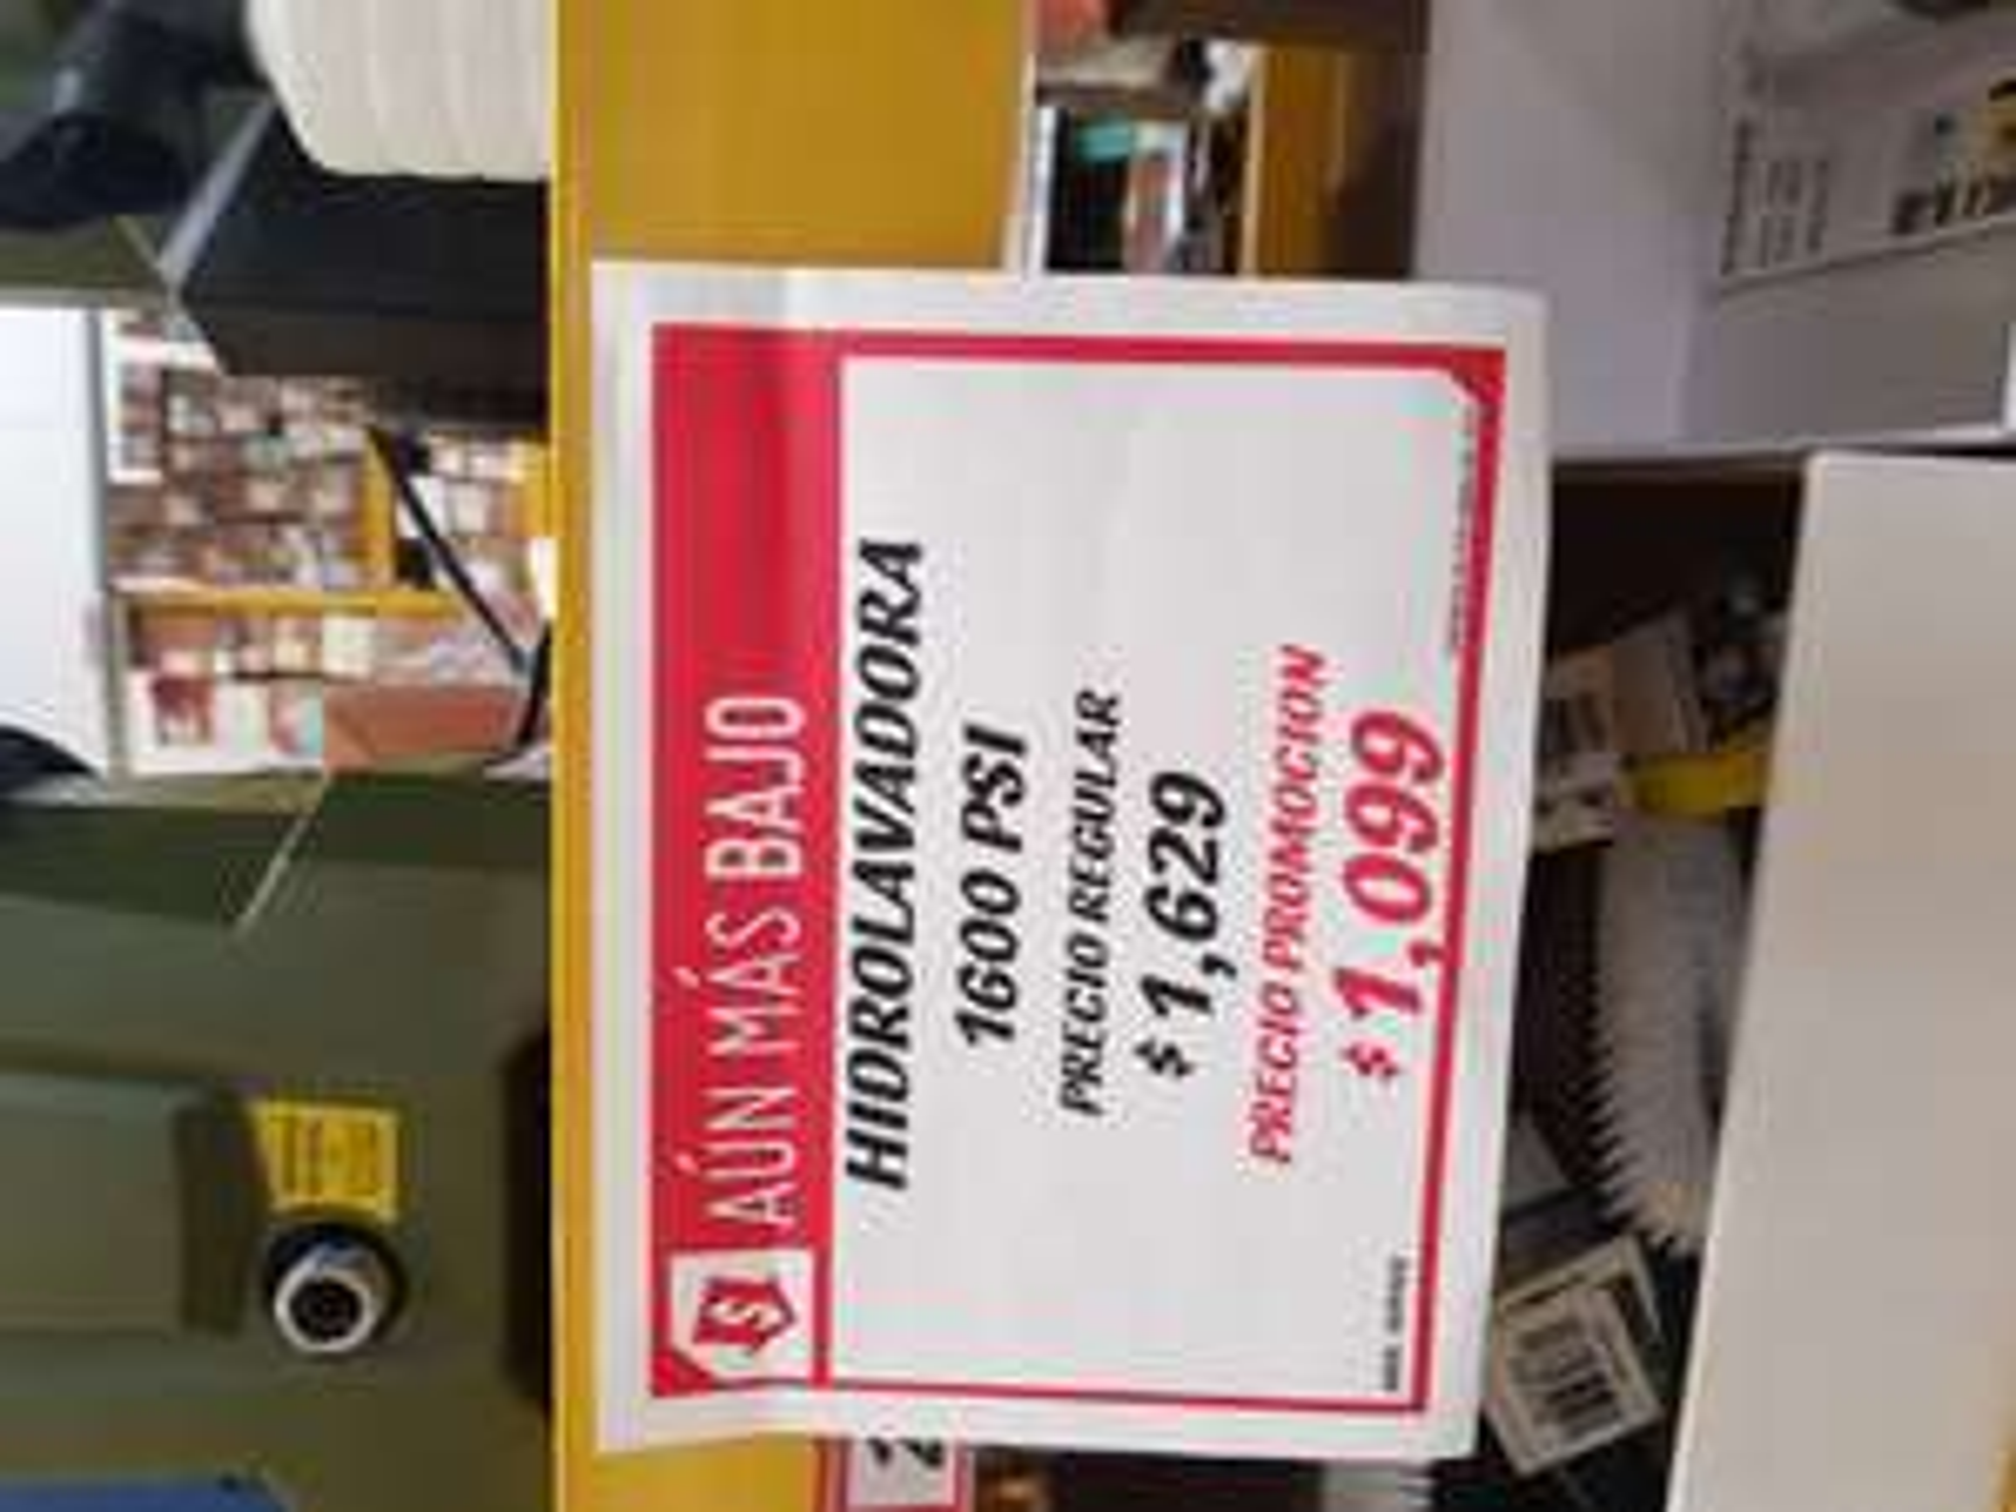 Sodimac: Hidrolavadora Bauker 1600 PSI a $1099 pesos